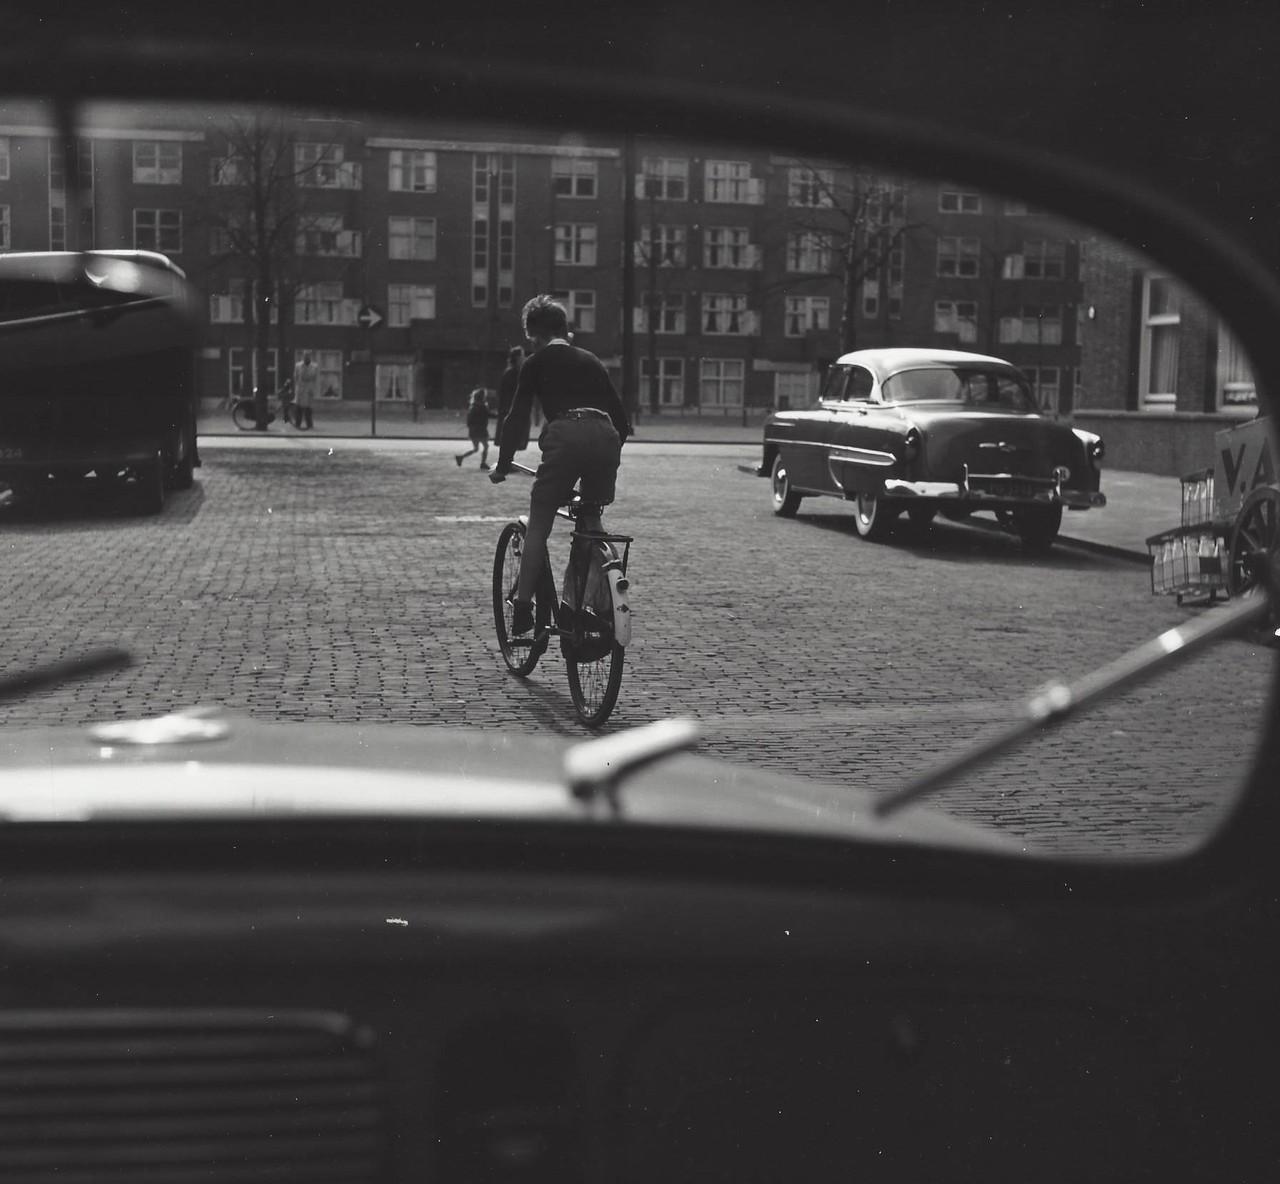 Движение, Амстердам, 1950-е. Фотограф Кис Шерер